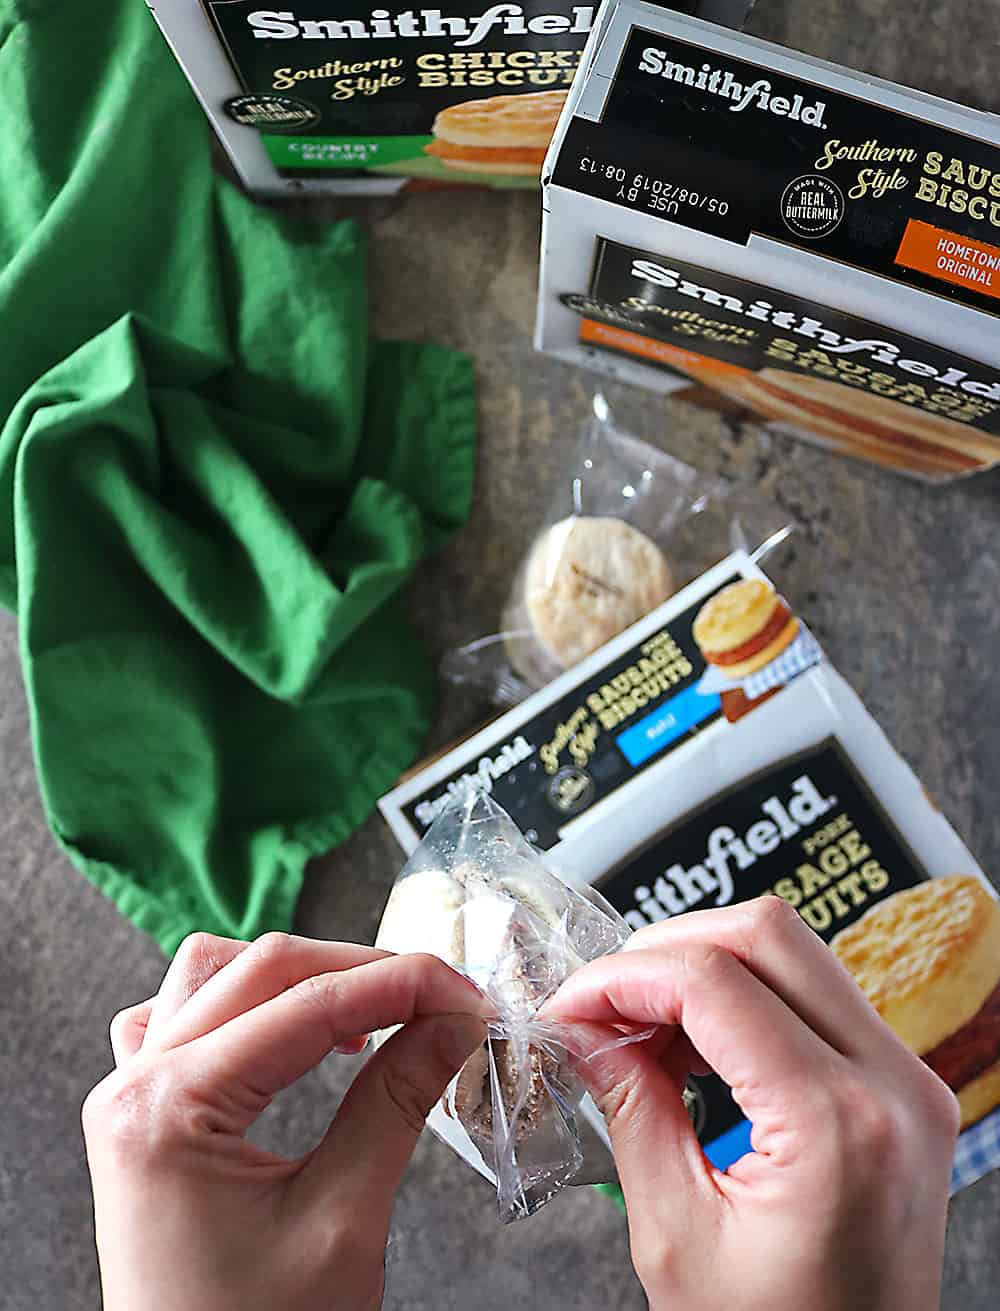 Photo Making Smithfield Breakfast Sandwiches